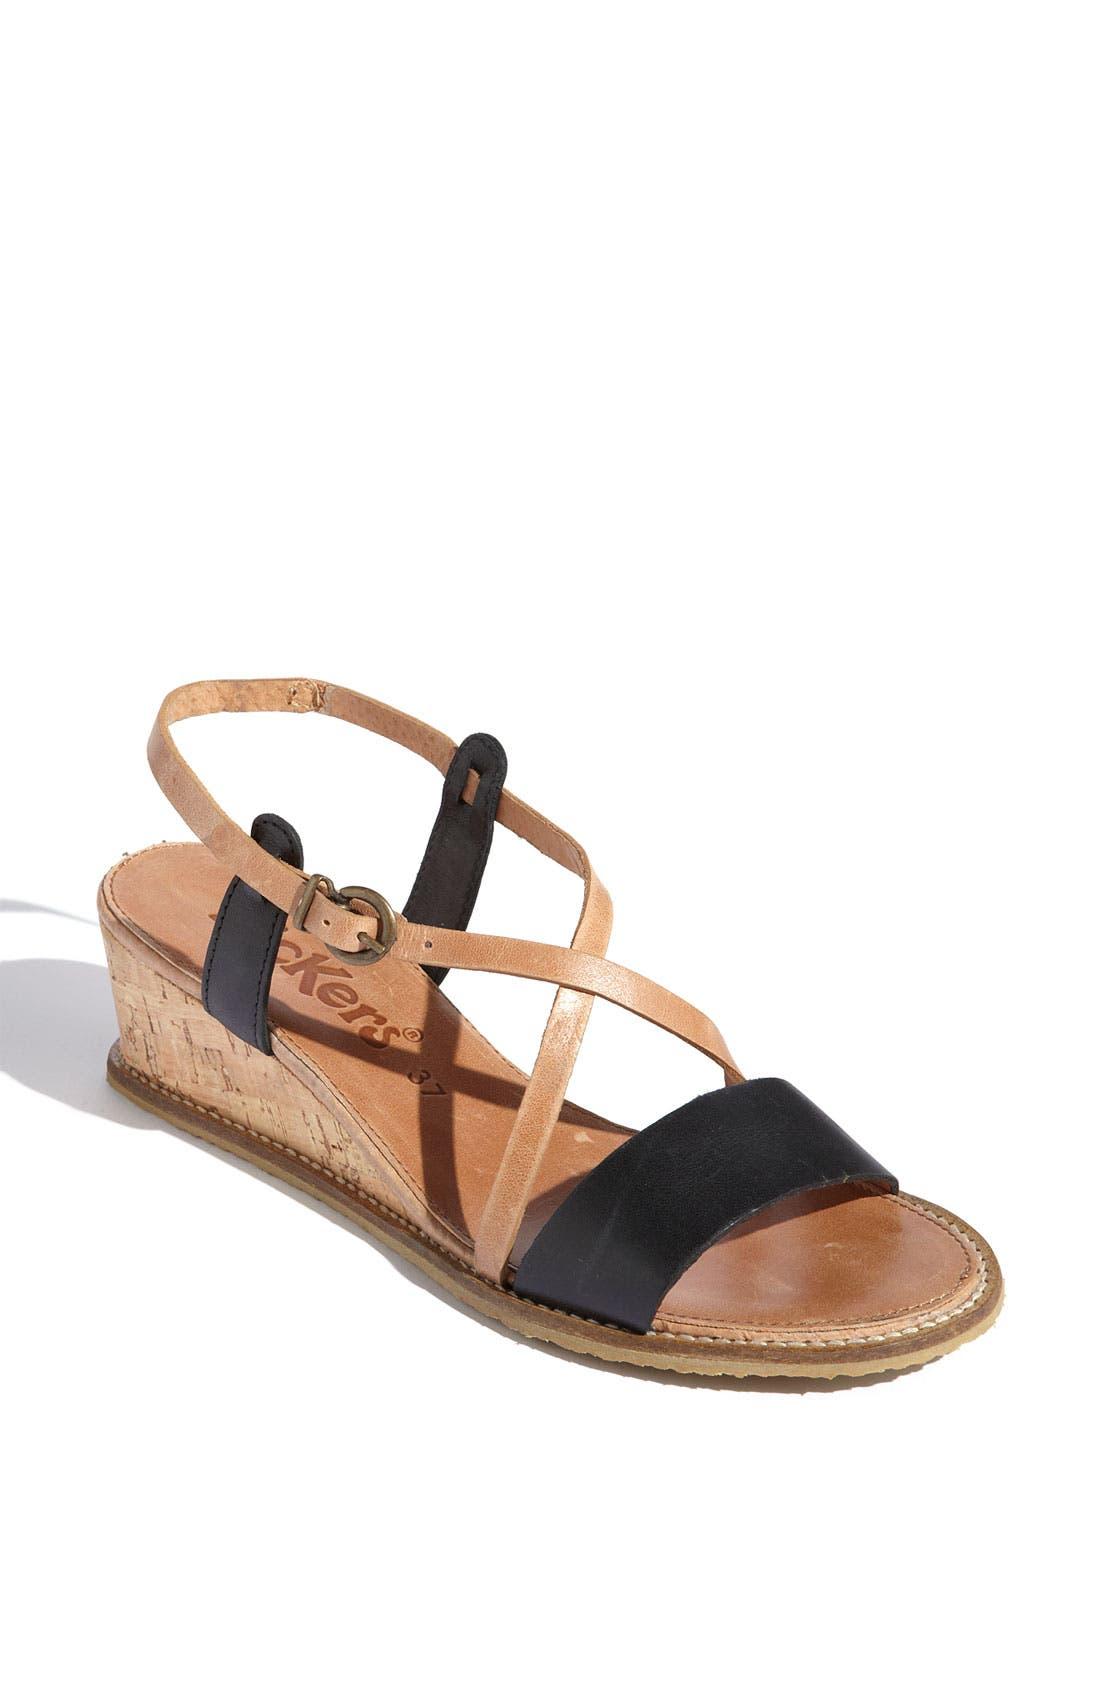 Alternate Image 1 Selected - Kickers 'Sushidue' Sandal